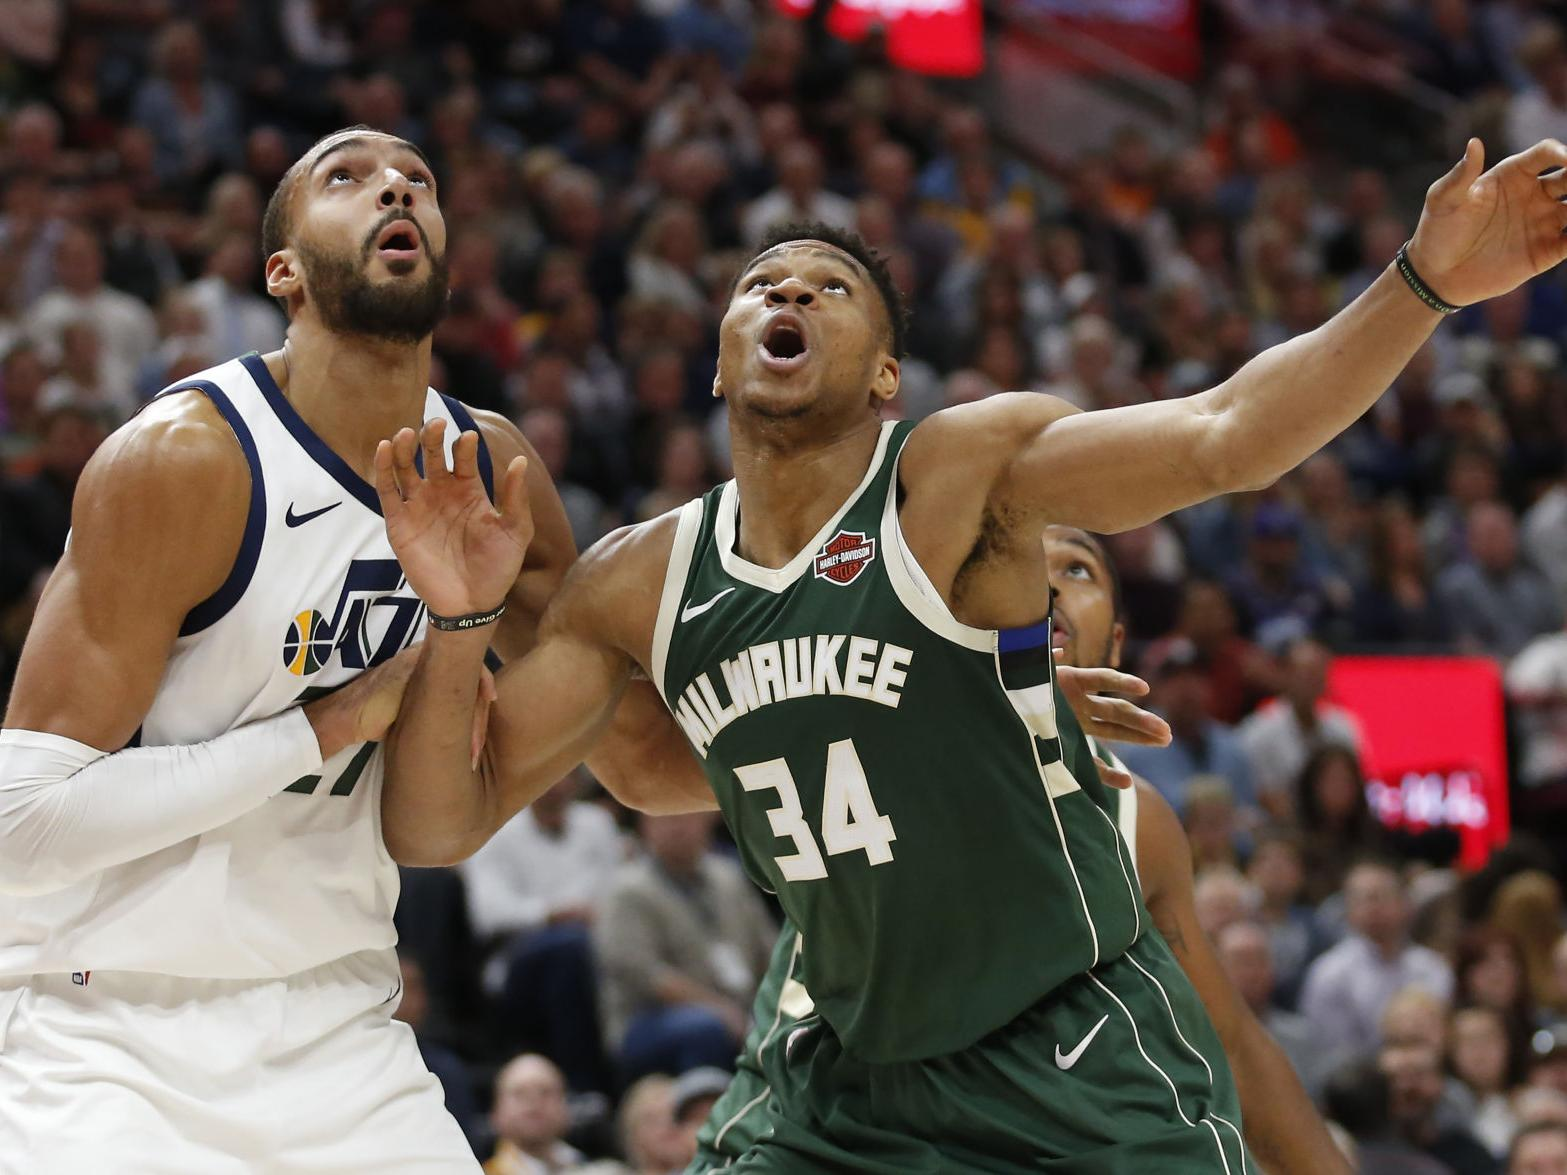 Bucks fall to Jazz on 3-pointer at buzzer | College Sports |  lacrossetribune.com